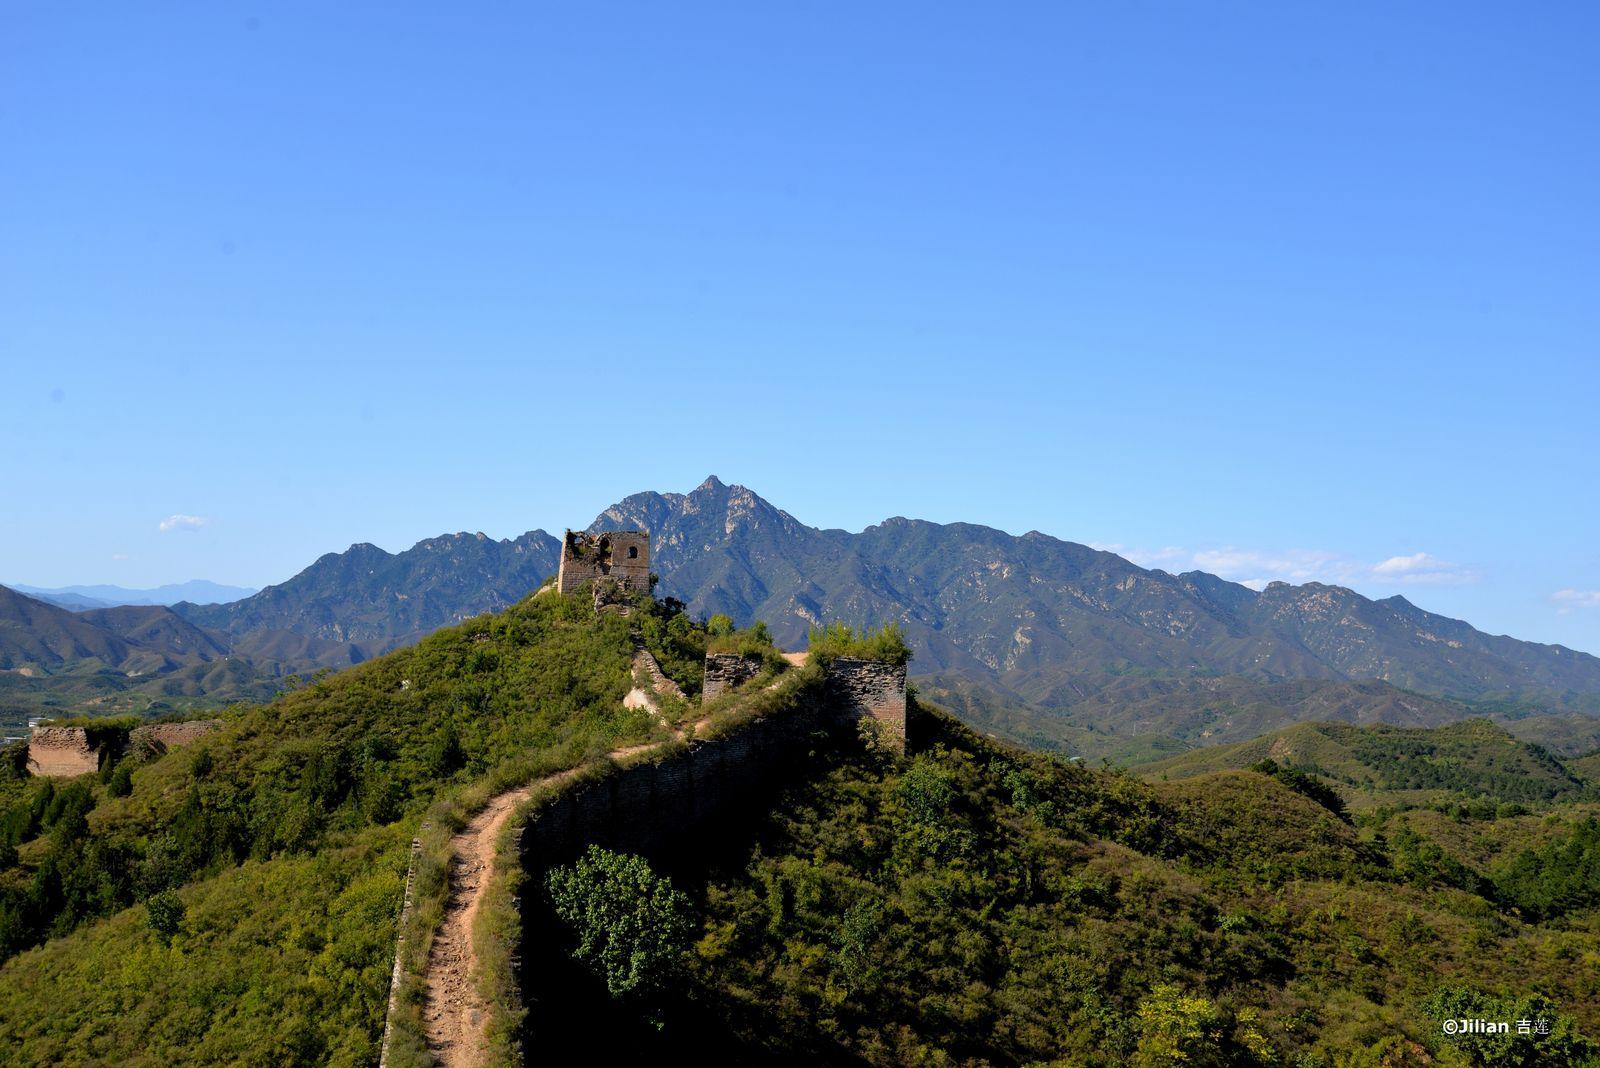 La Grande Muraille de Panlongshan : un serpent qui sinue - 古北口的蟠龙山长城